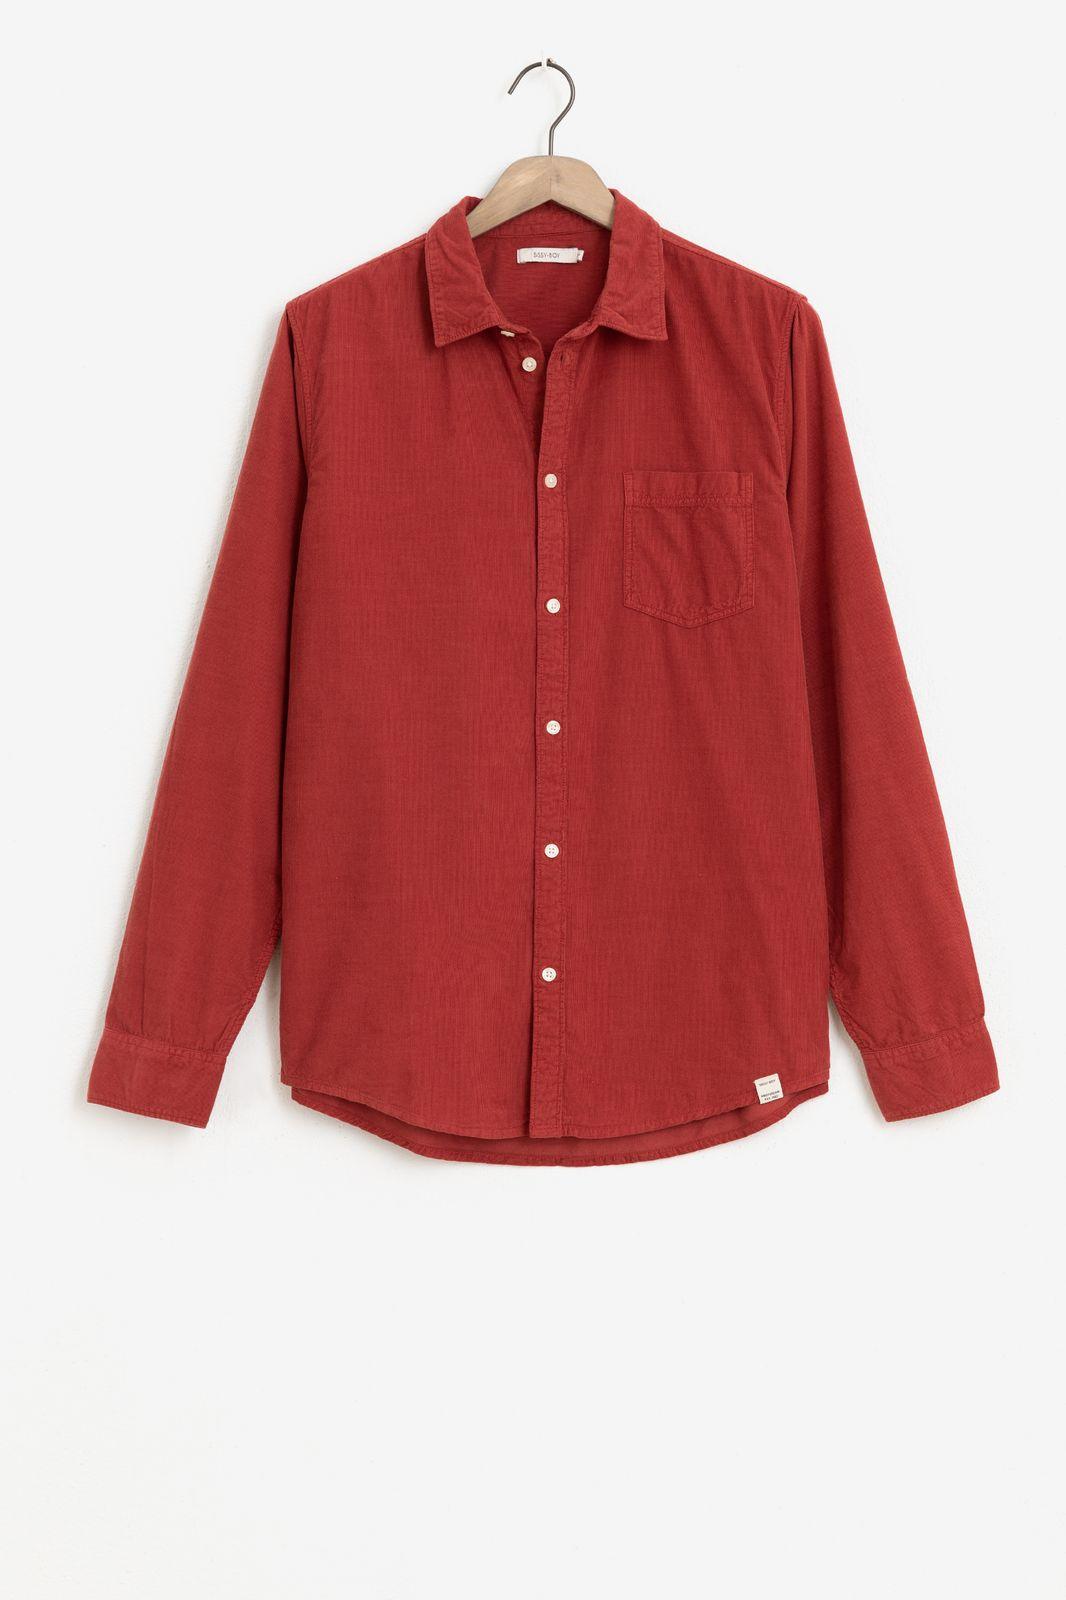 Donkerrood corduroy overhemd - Heren | Sissy-Boy